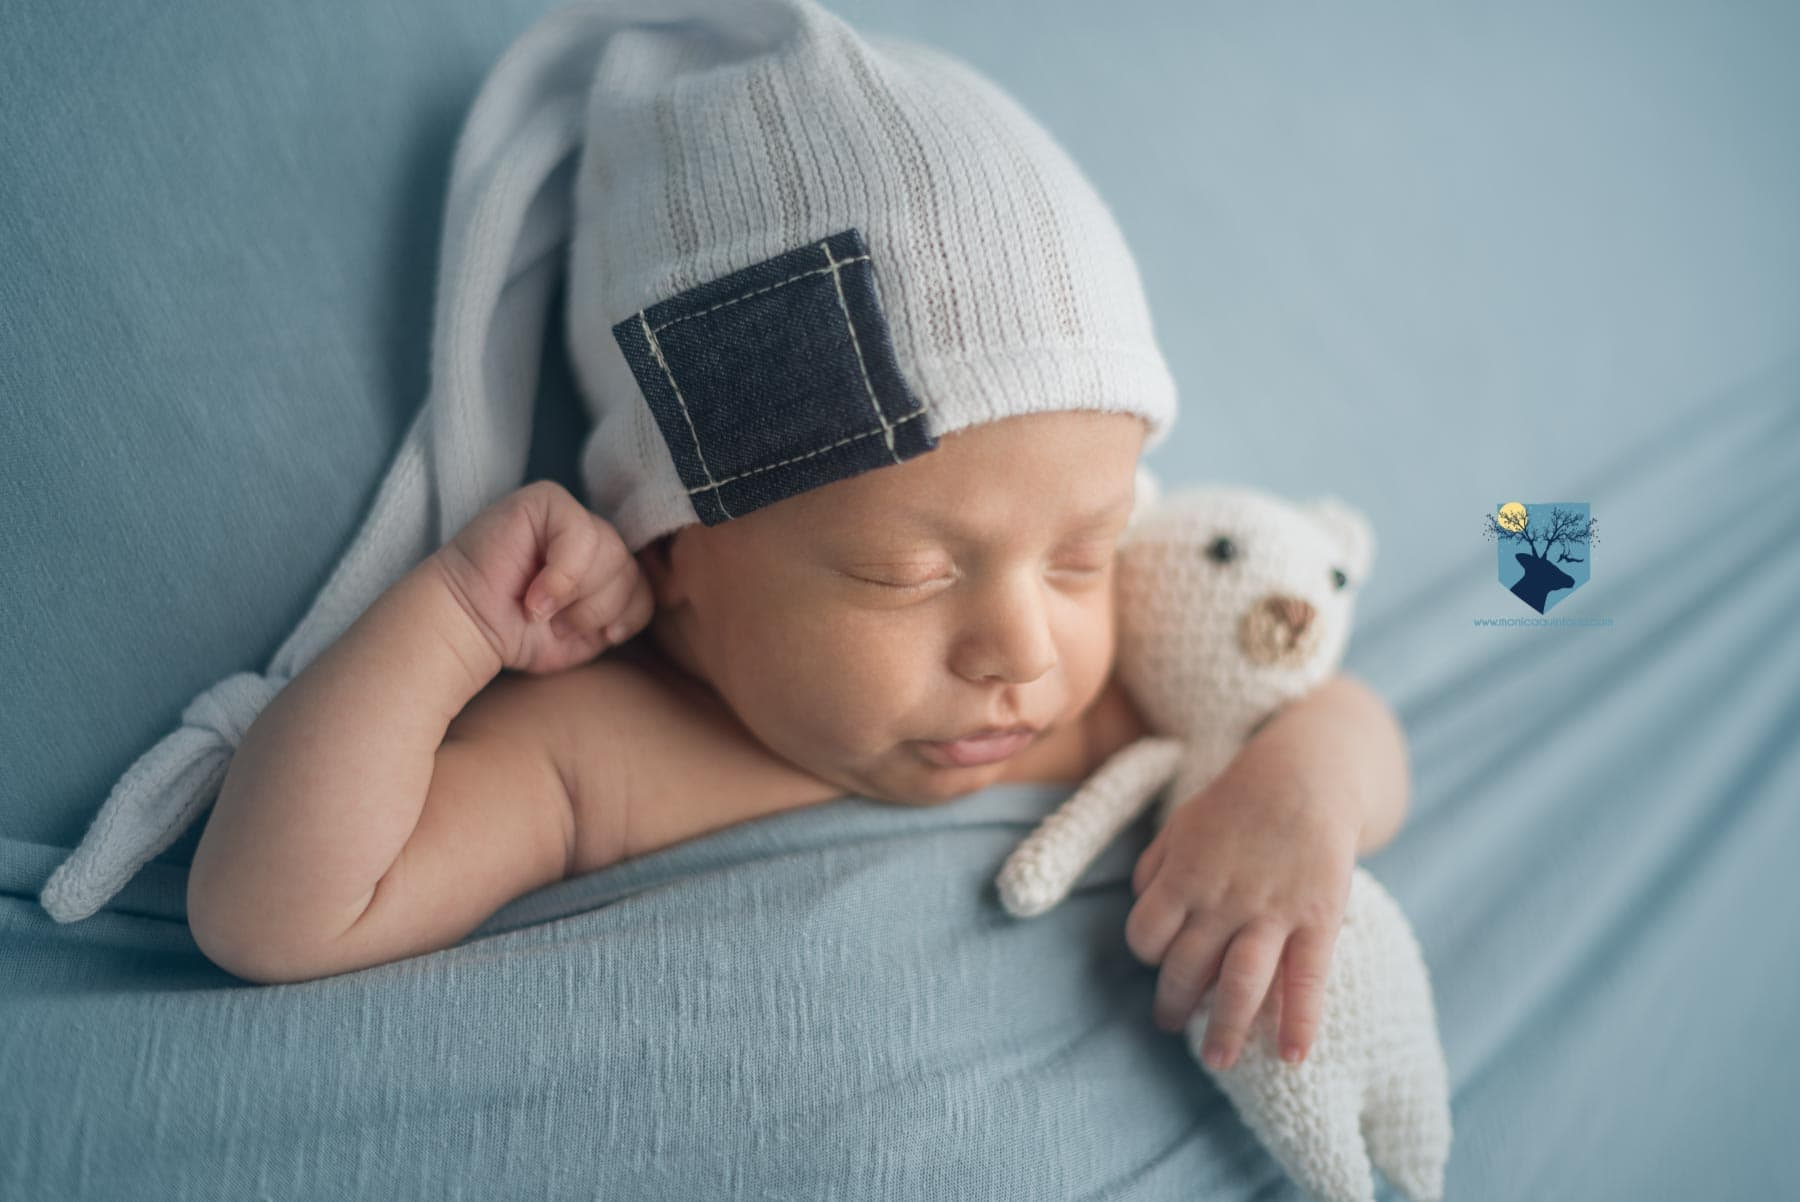 fotos de recién nacido en Girona, fotografia, fotos, girona, figueres, emporda, monica quintana, bebes, niños, recien nacido, ,newborn, familia, retrato